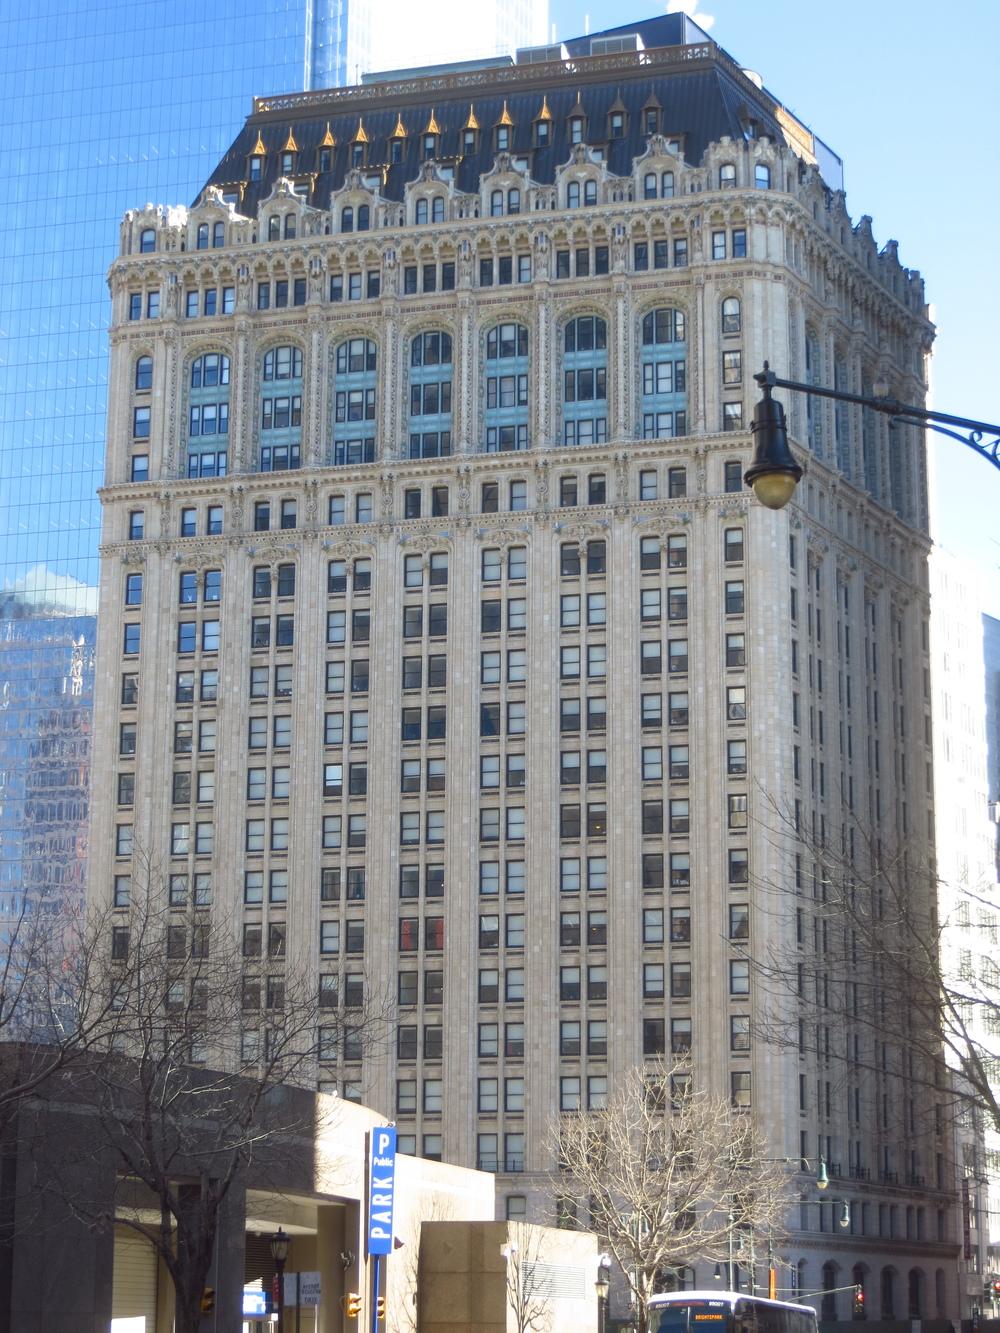 90 West St. (b. 1907)